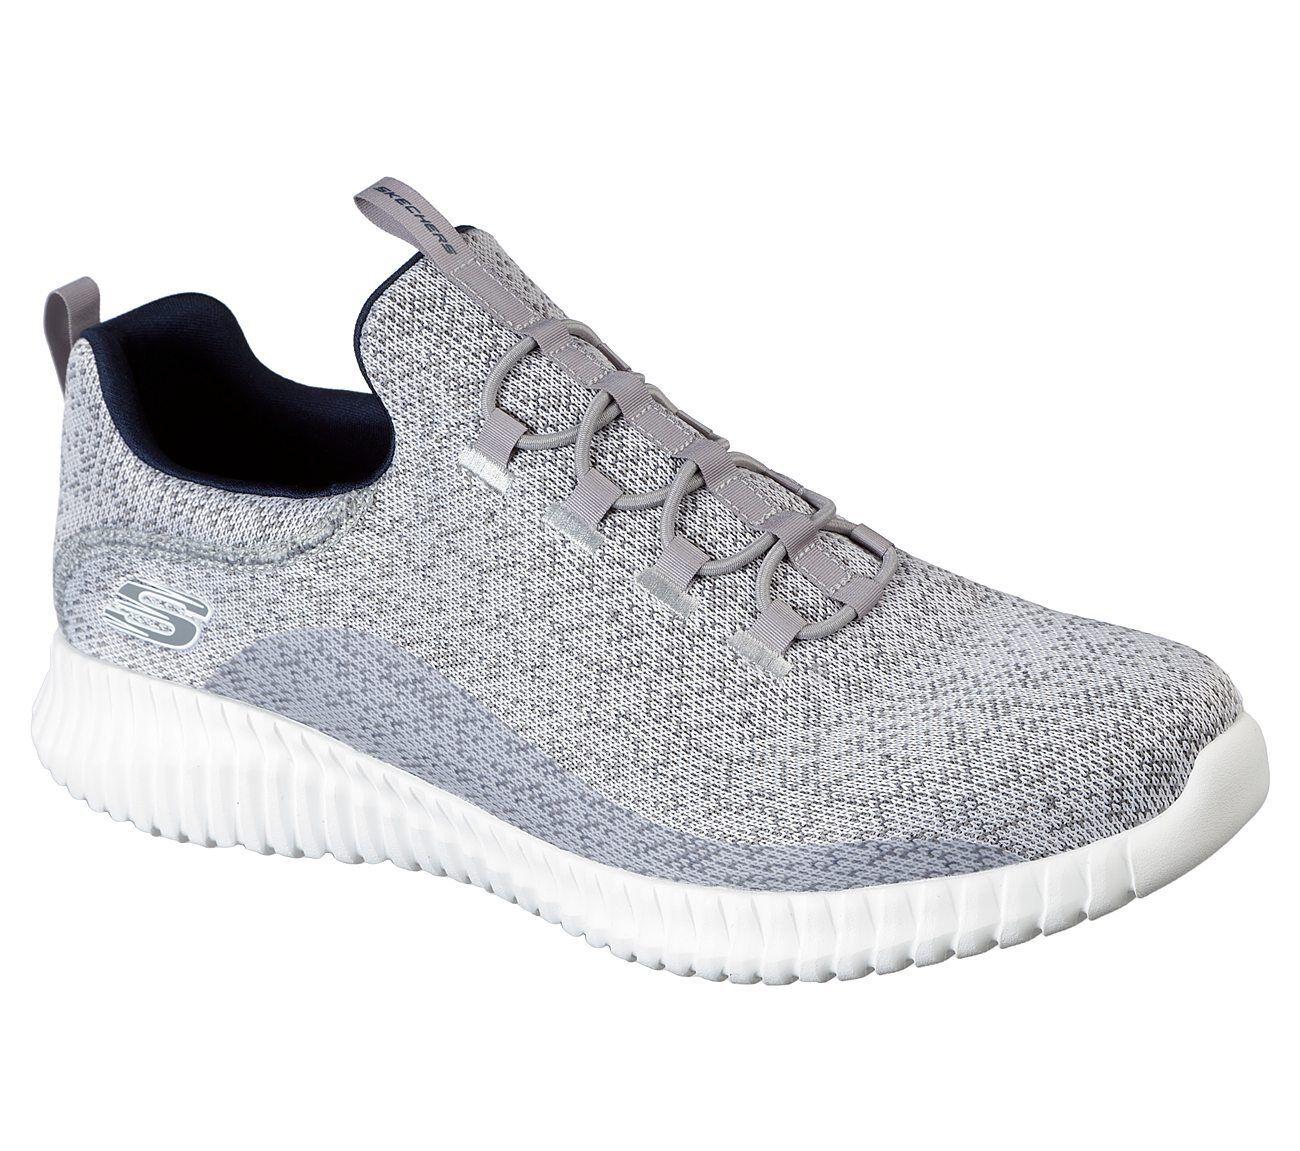 SK41/LGNV ELITE FLEX -MUZ Mn's Price reduction Light Gray Knit Mesh Athletic Shoes